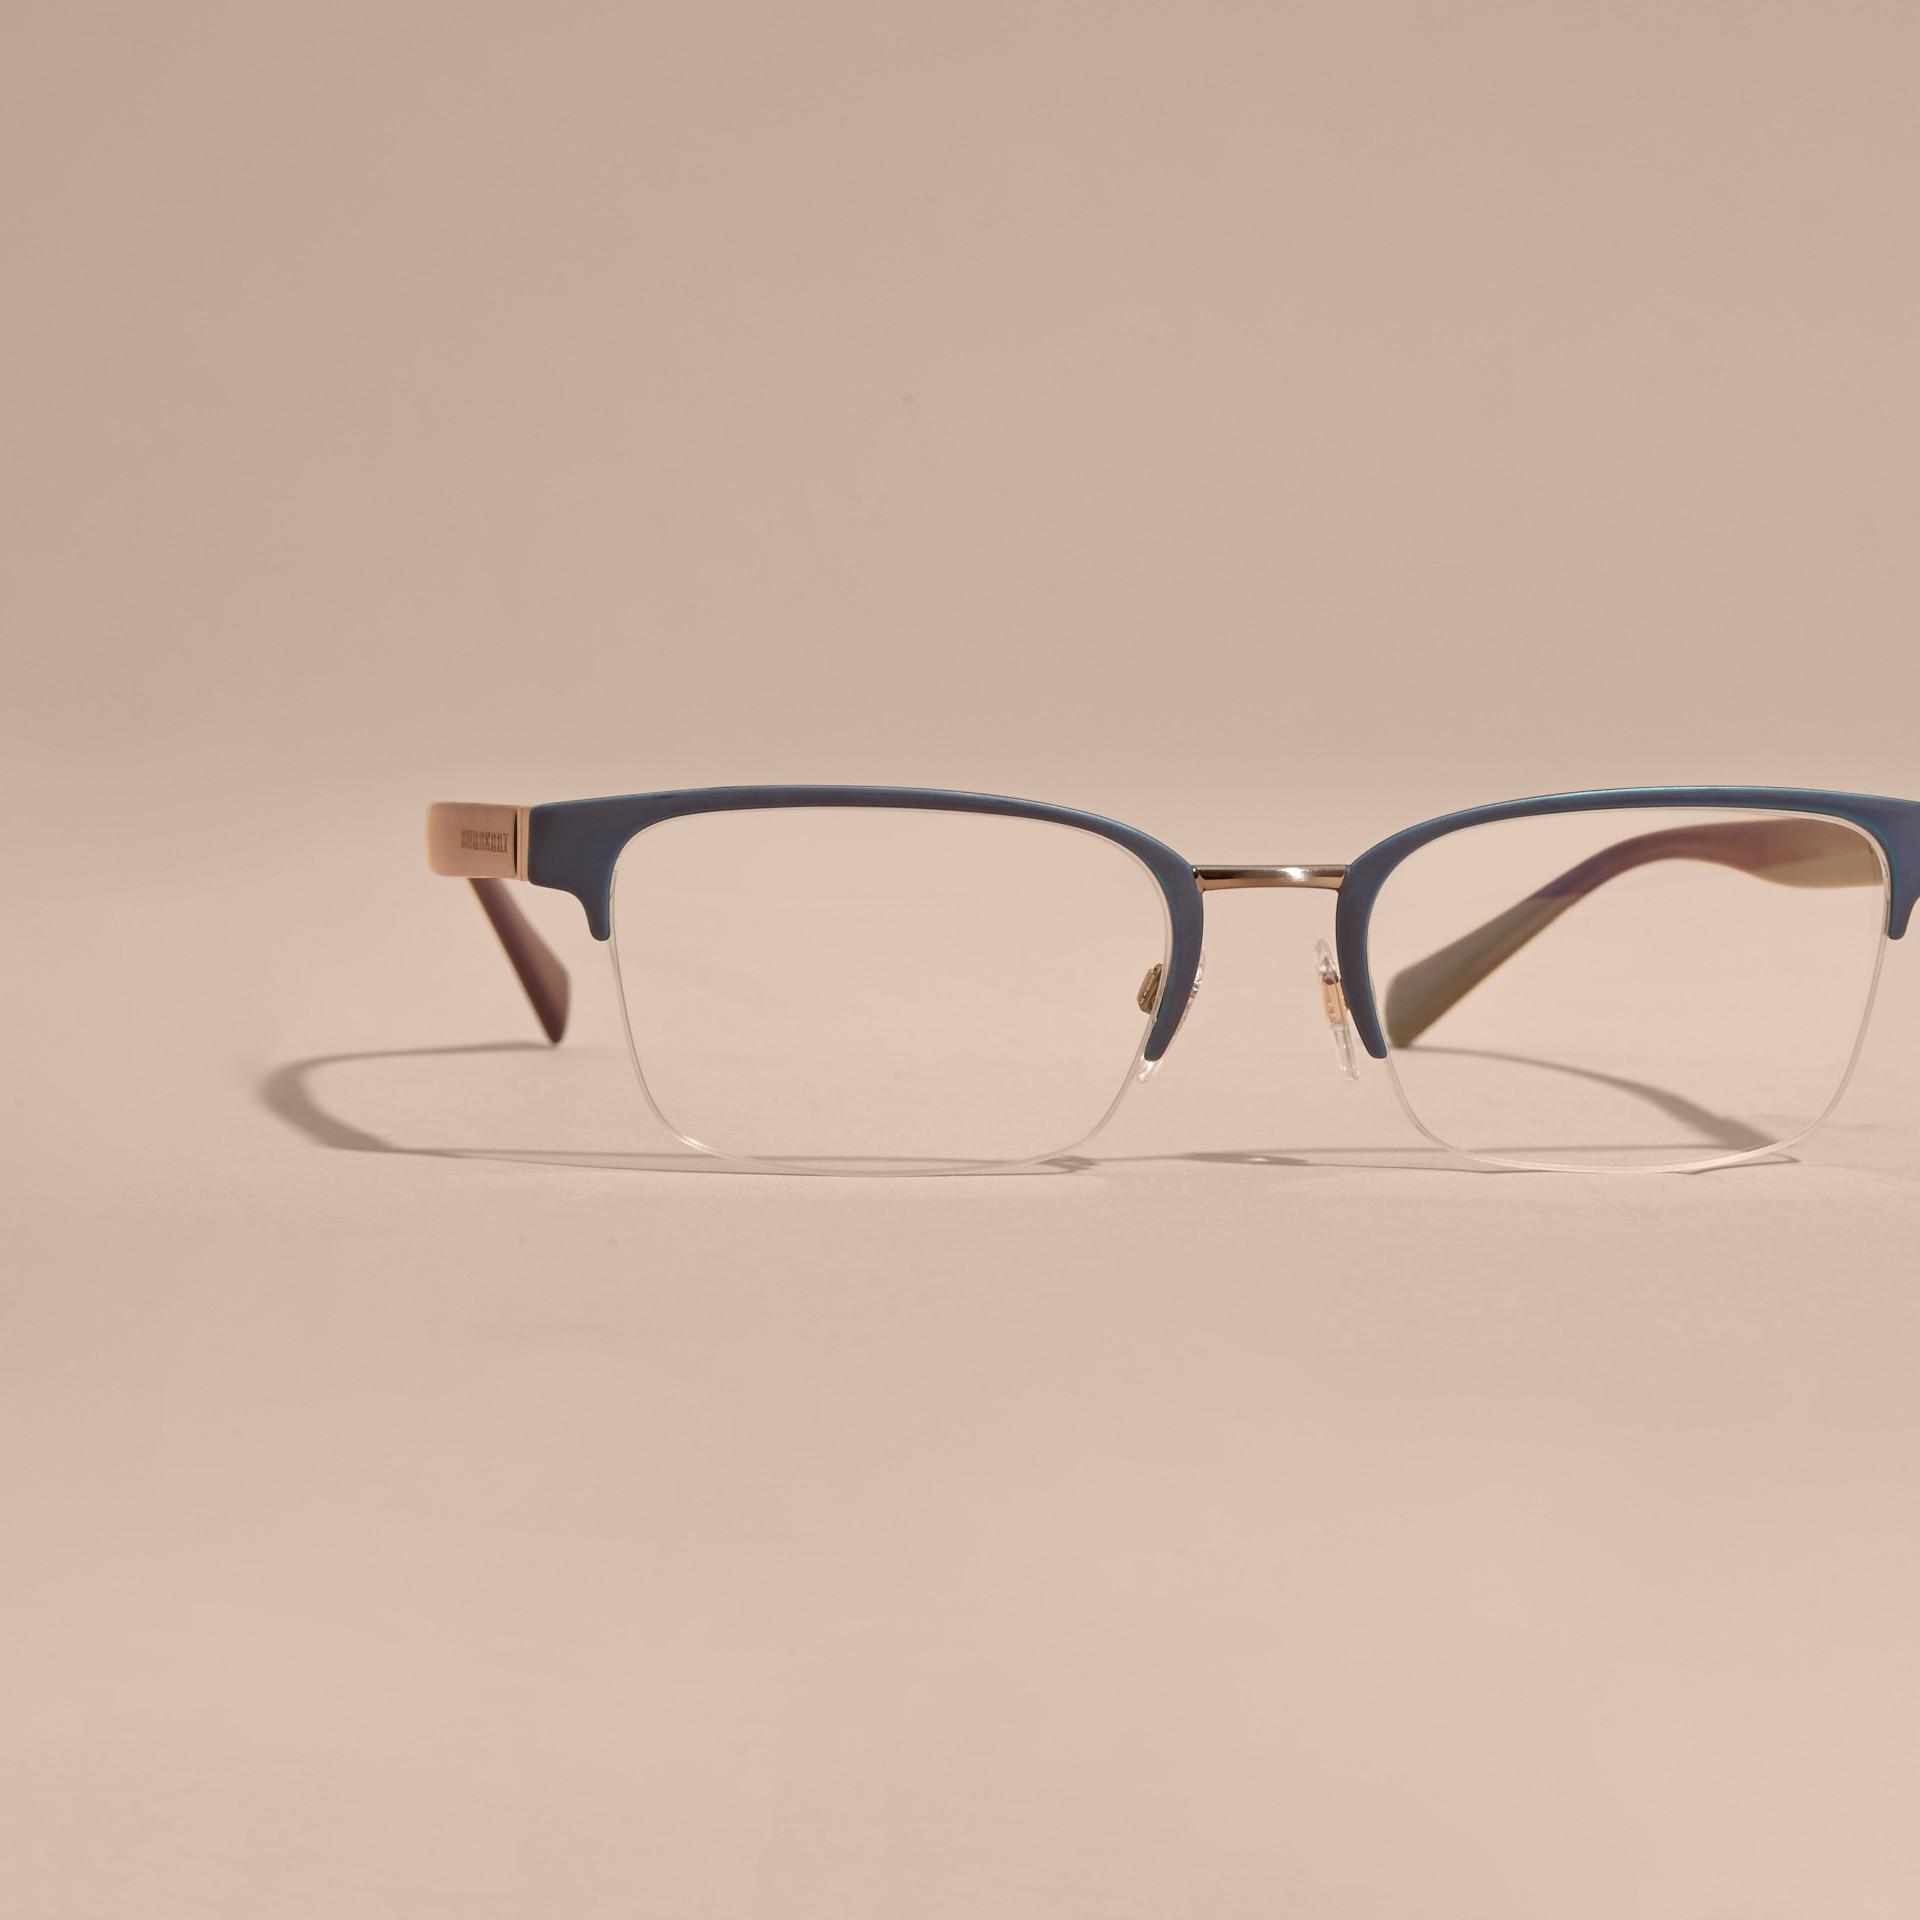 Half-rimmed Rectangular Optical Frames Dark Navy Burberry